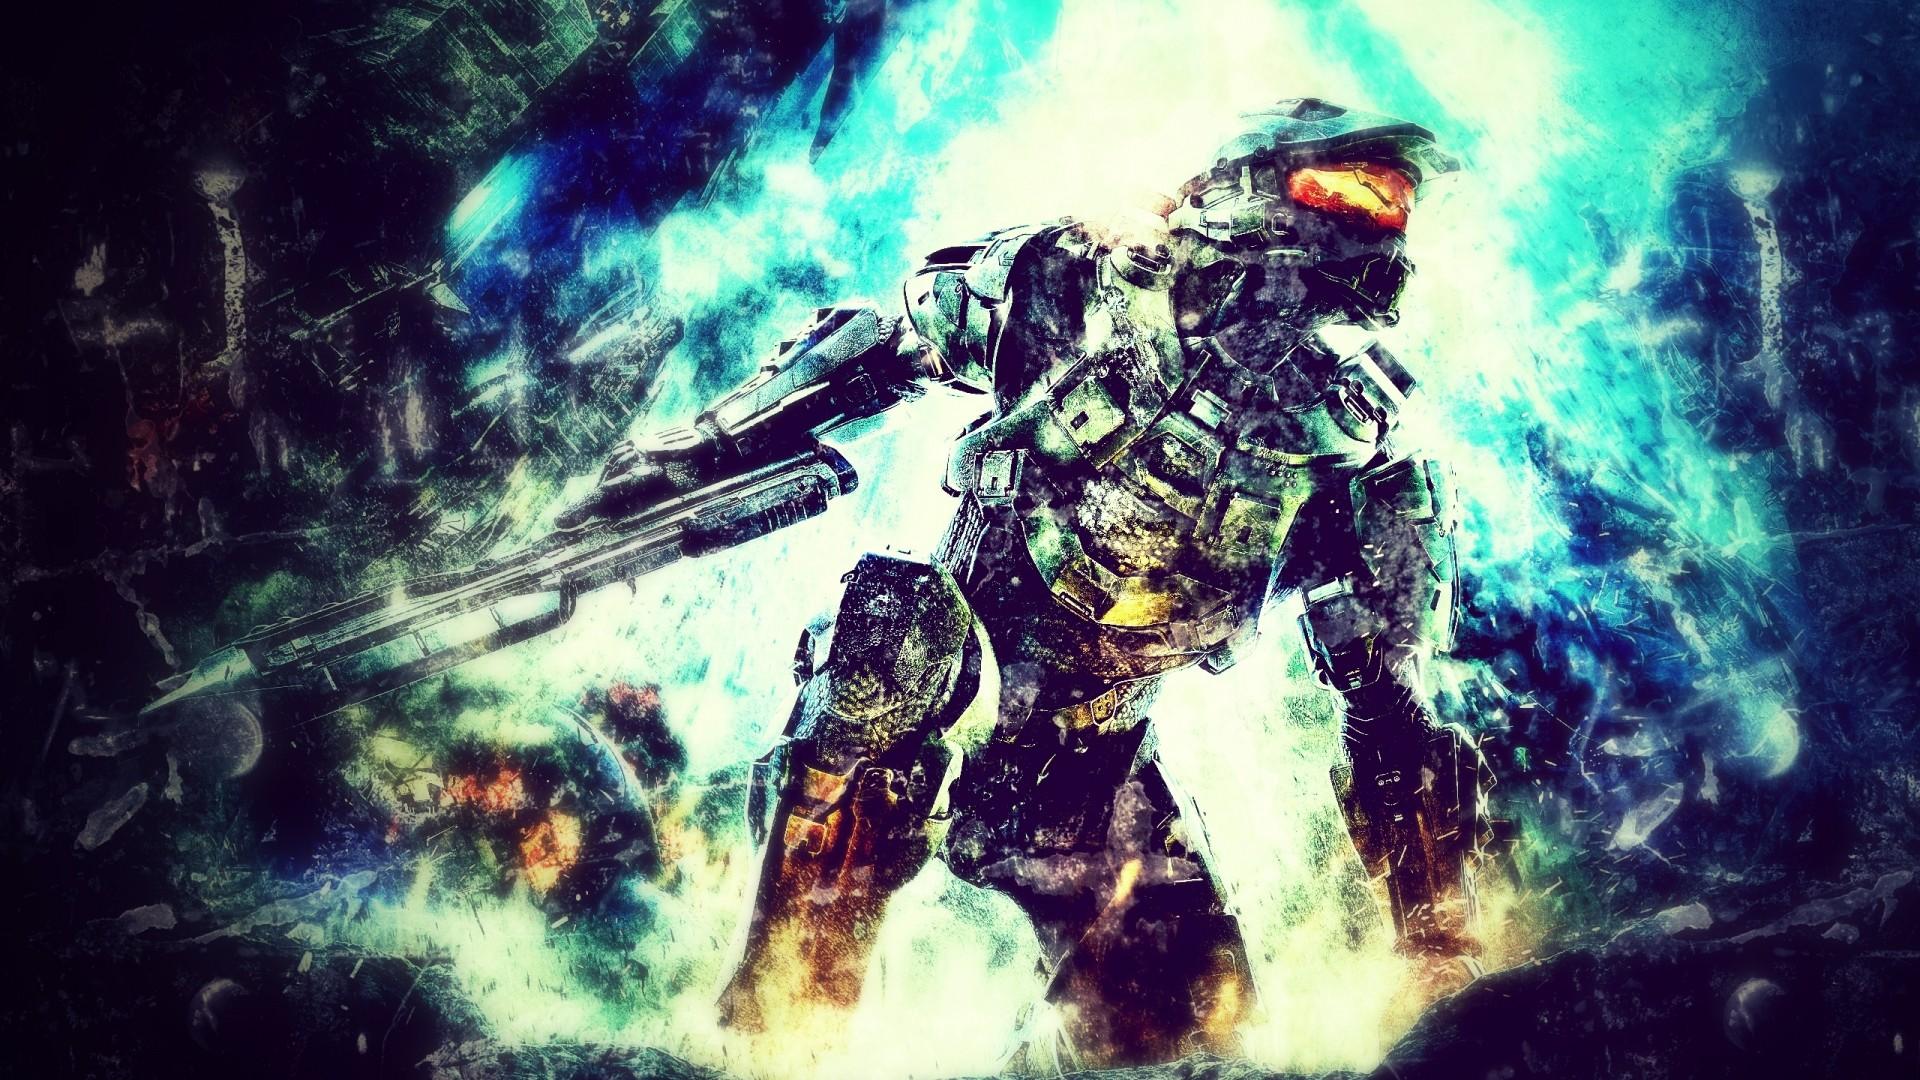 Halo 4 Wallpapers 3, Halo 4 Wallpapers, Desktop Wallpapers .